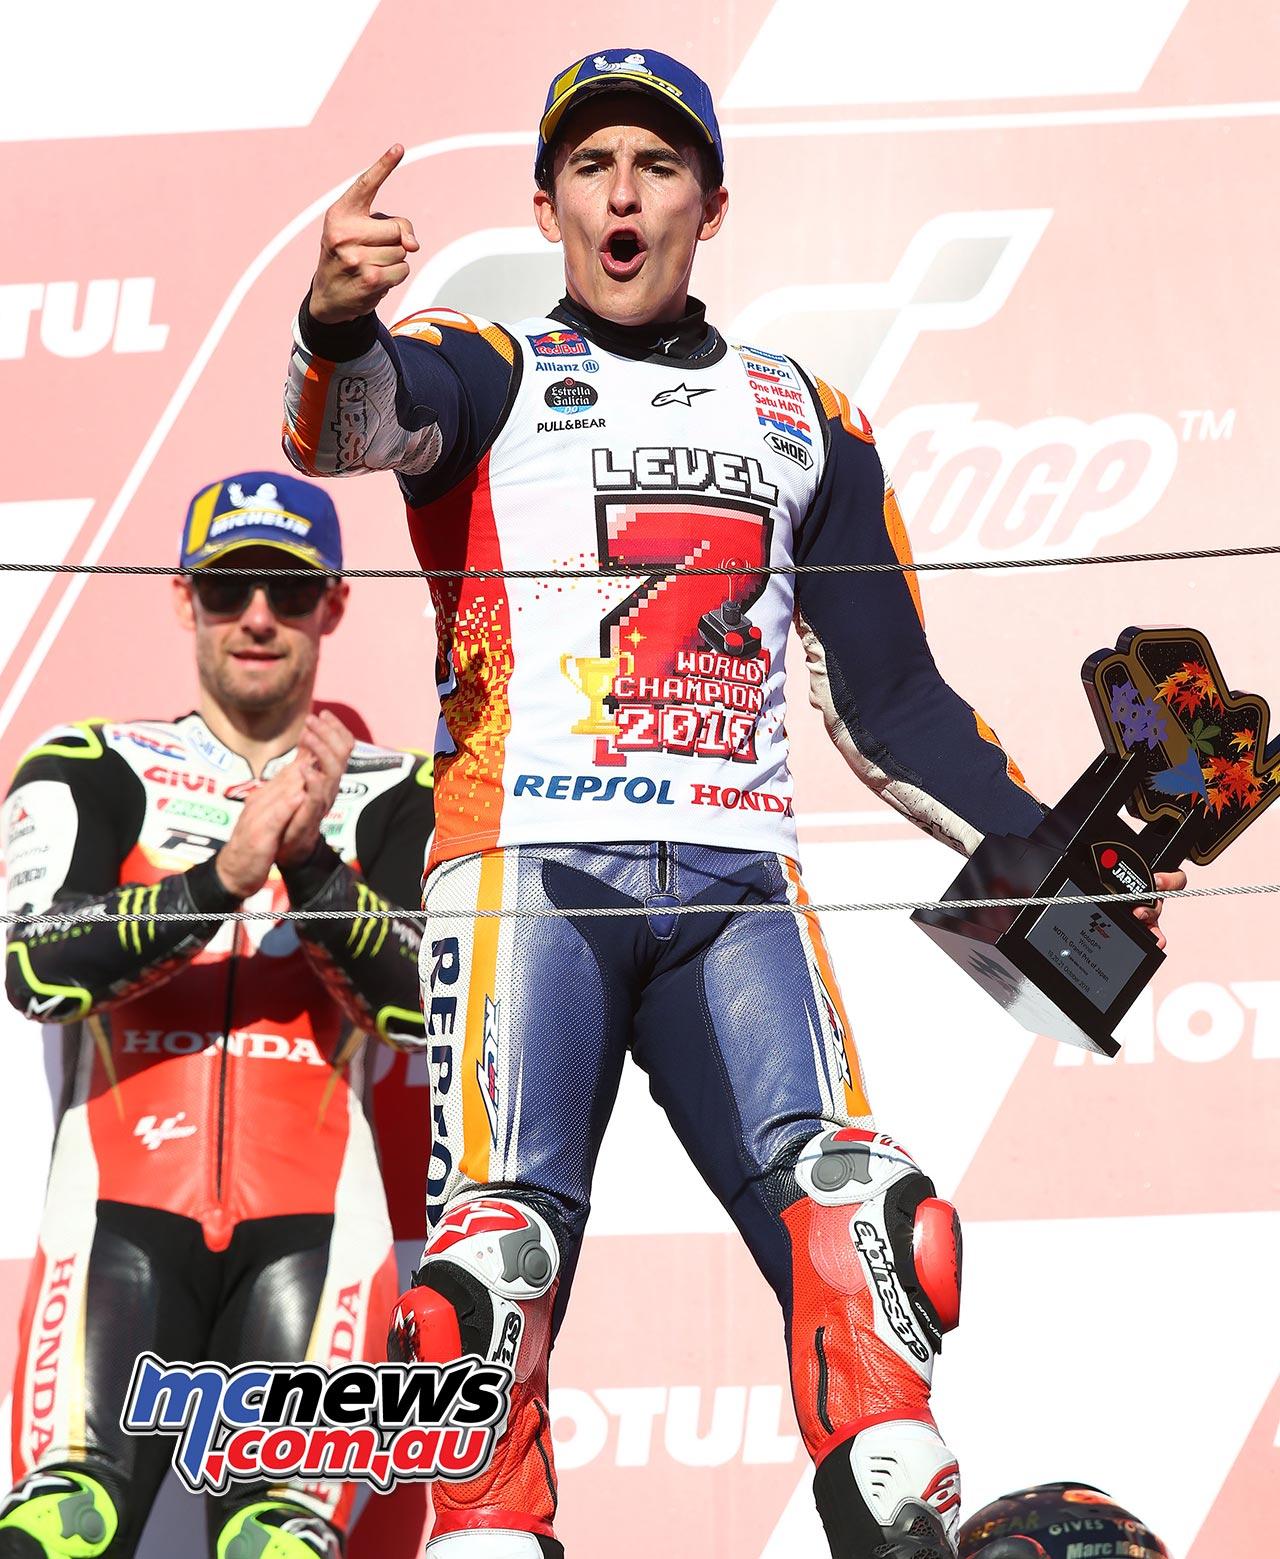 Motogp 2018: 2018 Motegi MotoGP Images